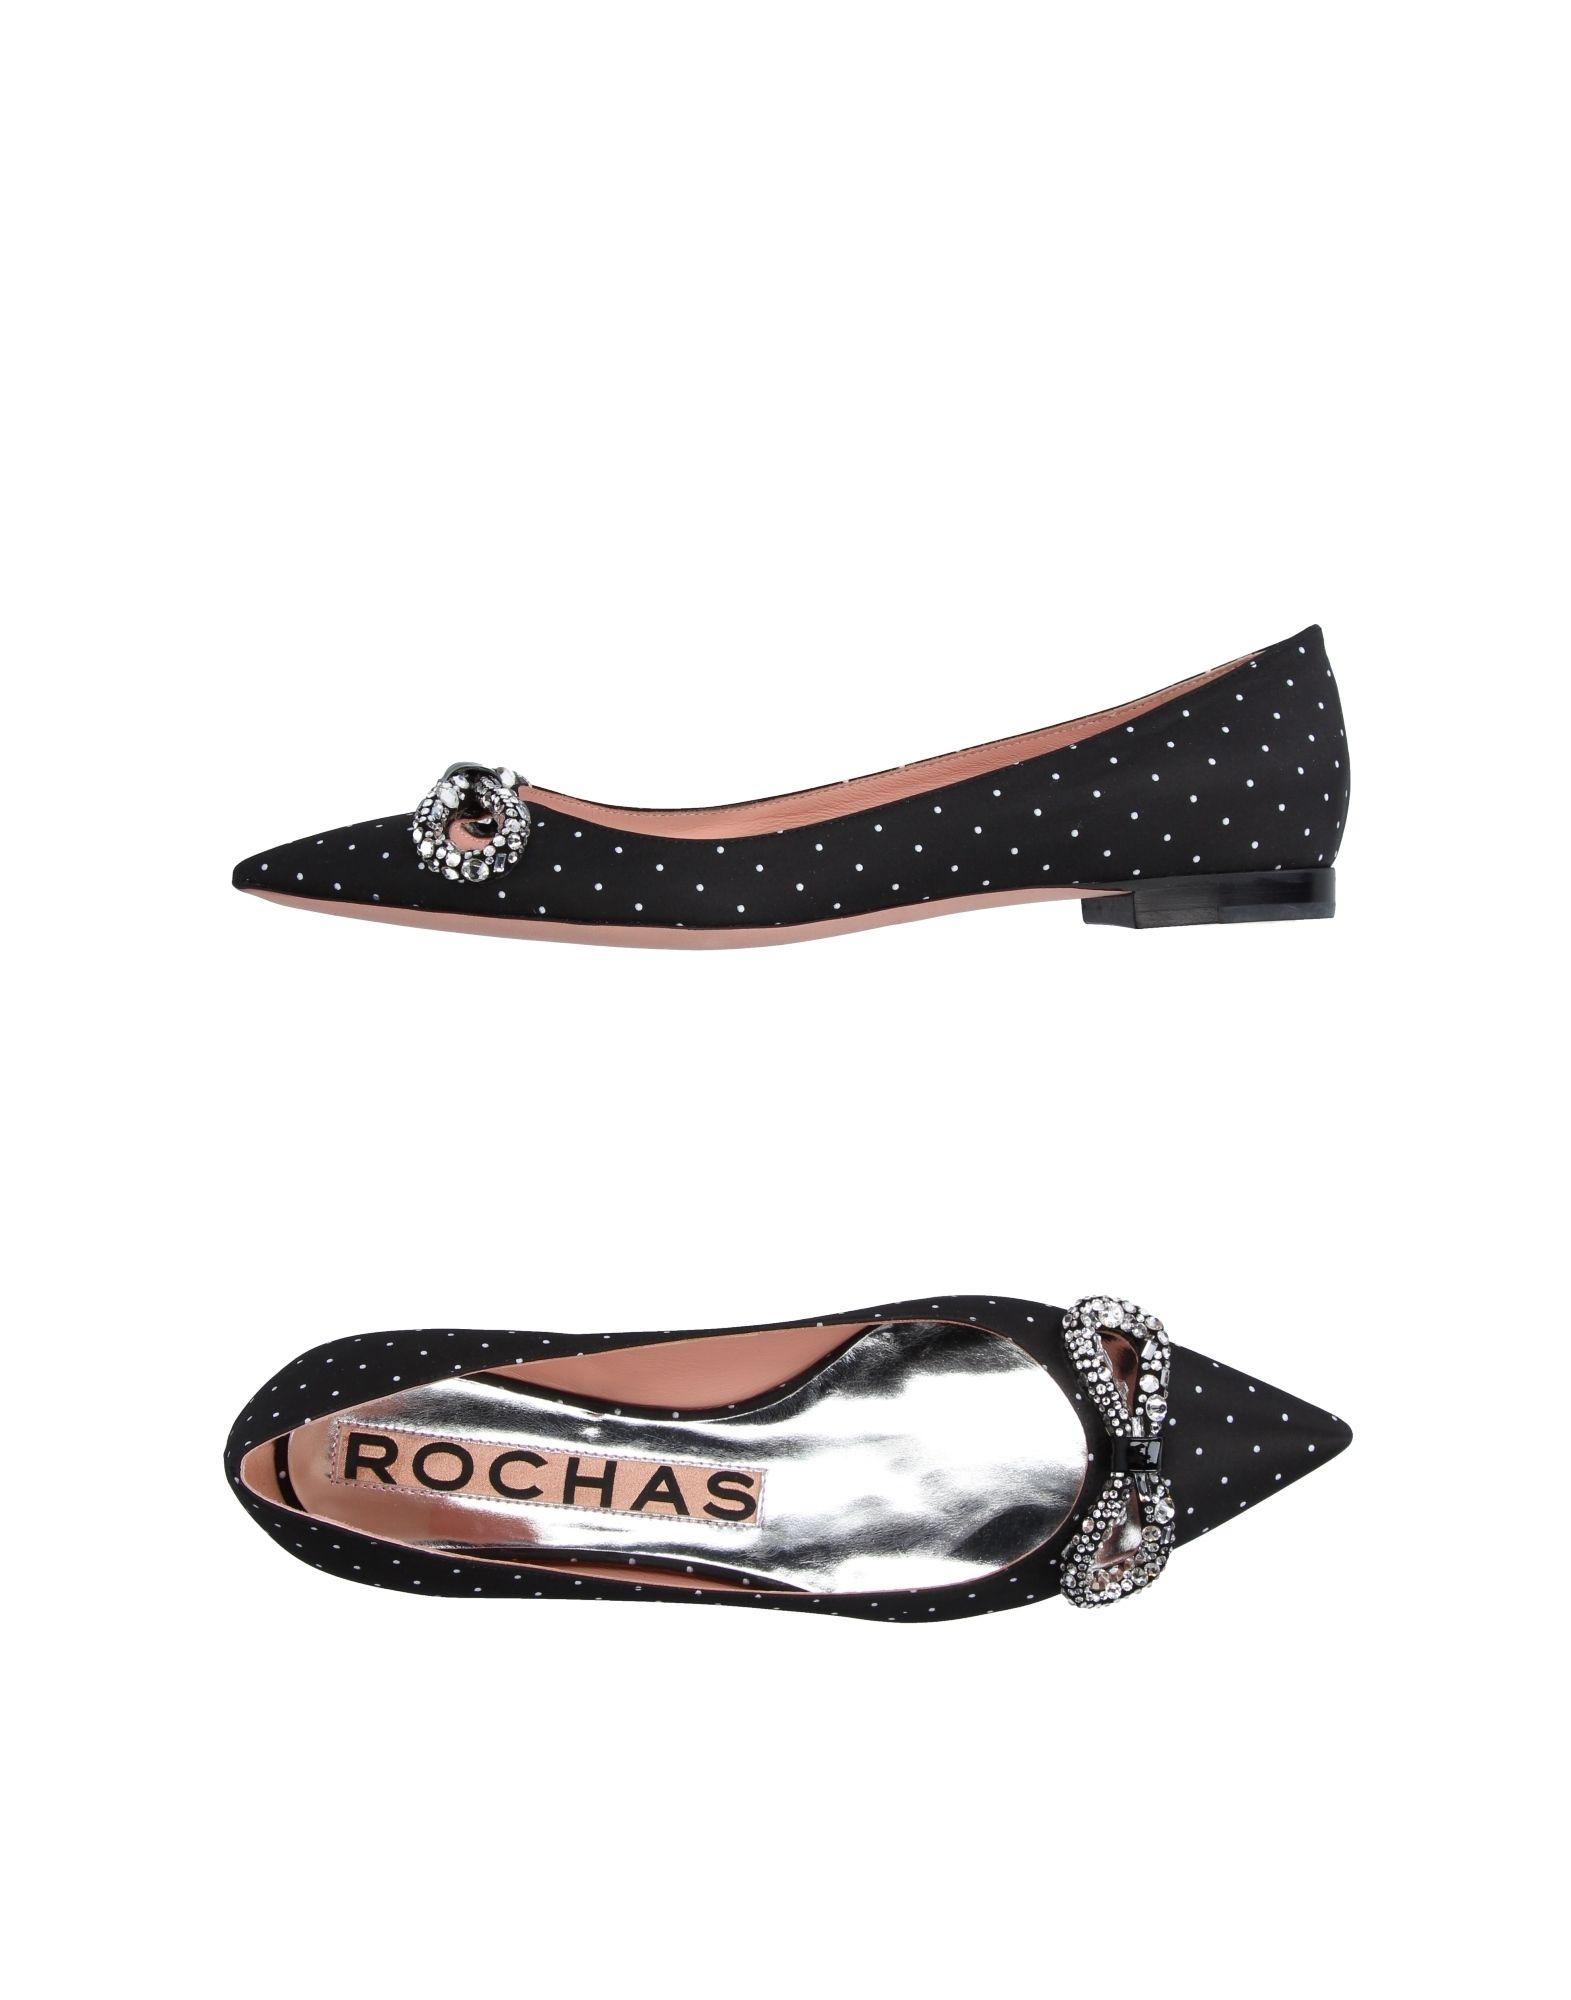 Schuhe Rochas Ballerinas Damen  11205153TG Heiße Schuhe  ea2a58